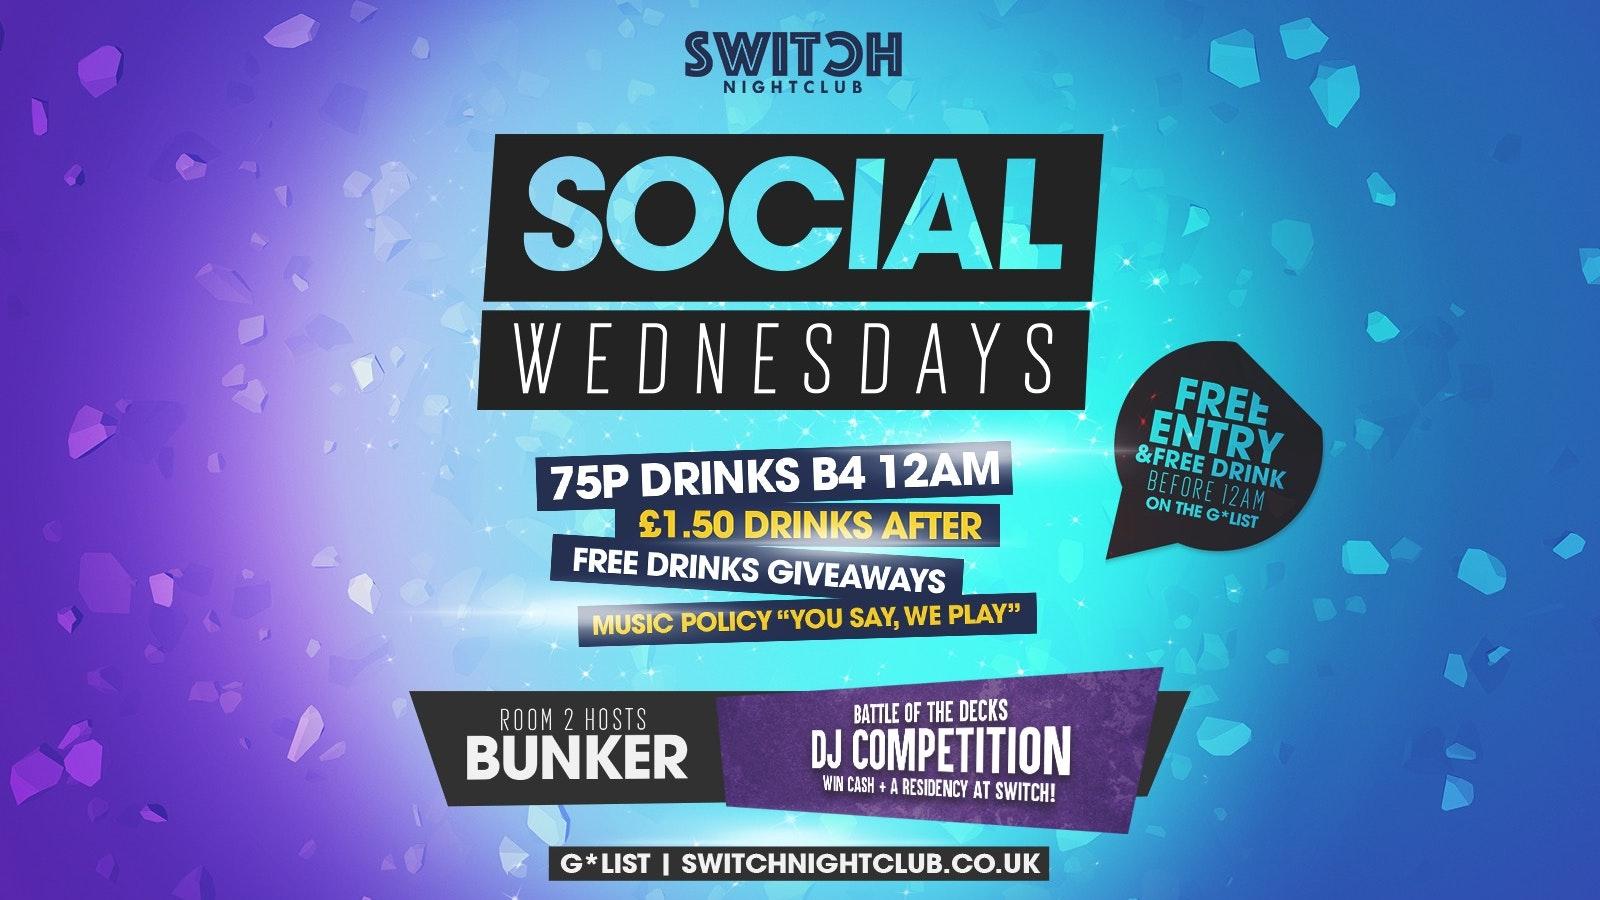 Social Wednesday's 75p Drinks